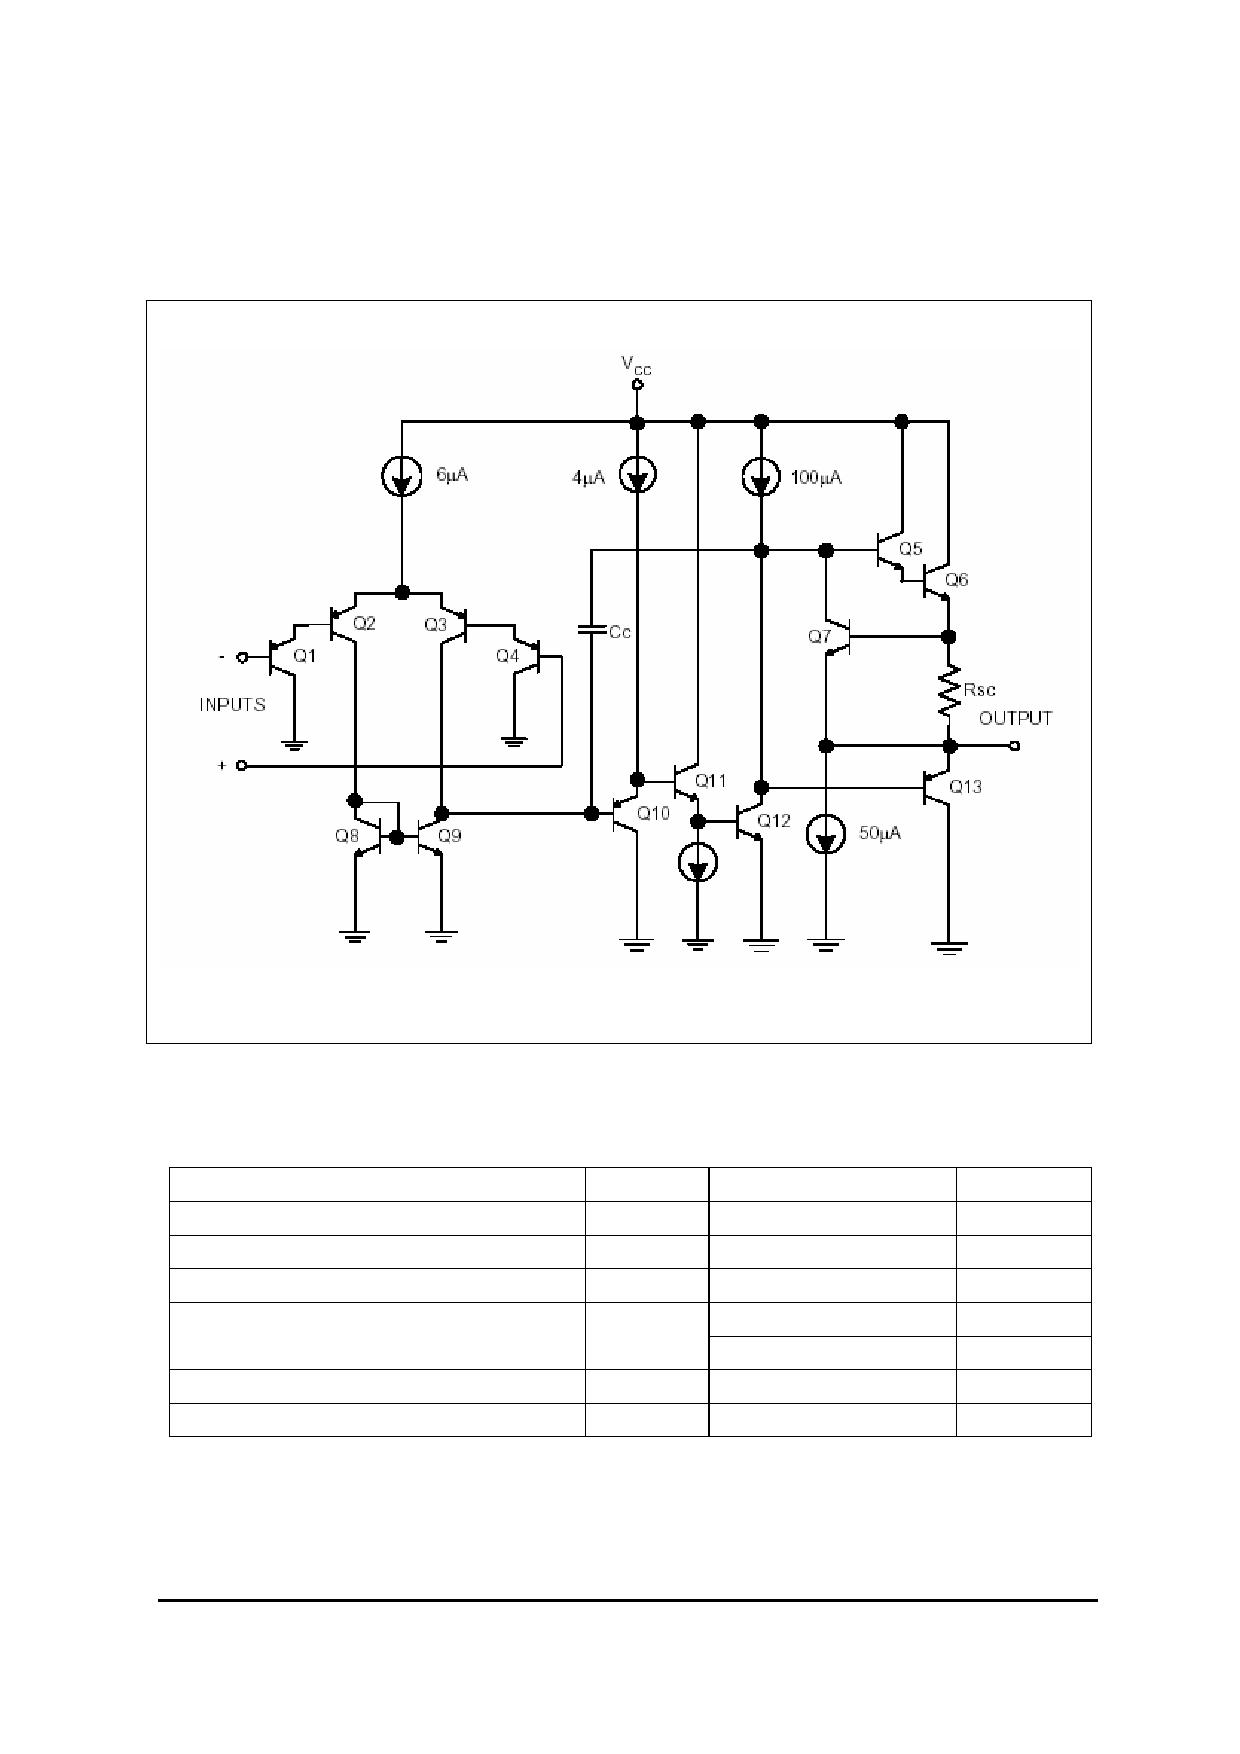 MB324 pdf, 전자부품, 반도체, 판매, 대치품